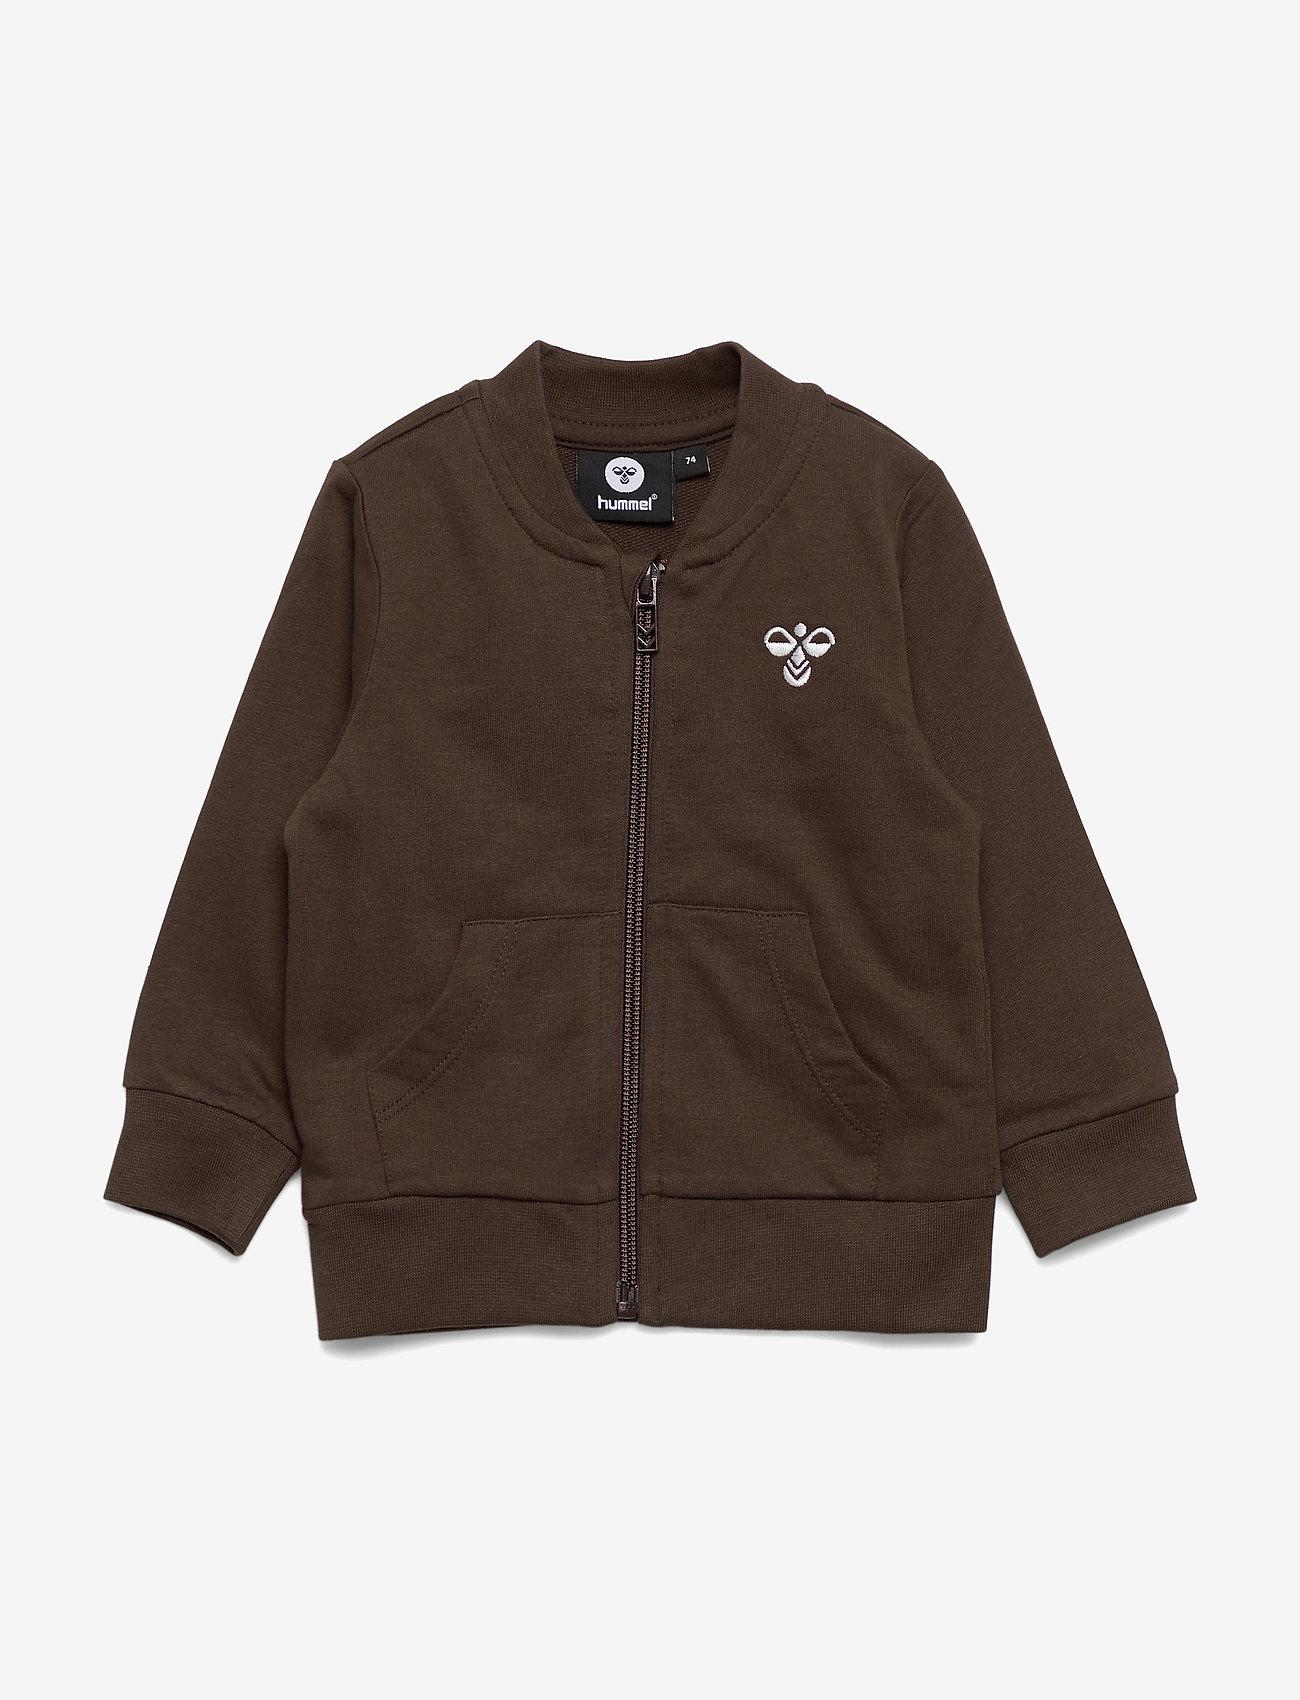 Hummel - hmlJUNO ZIP JACKET - sweatshirts - java - 0